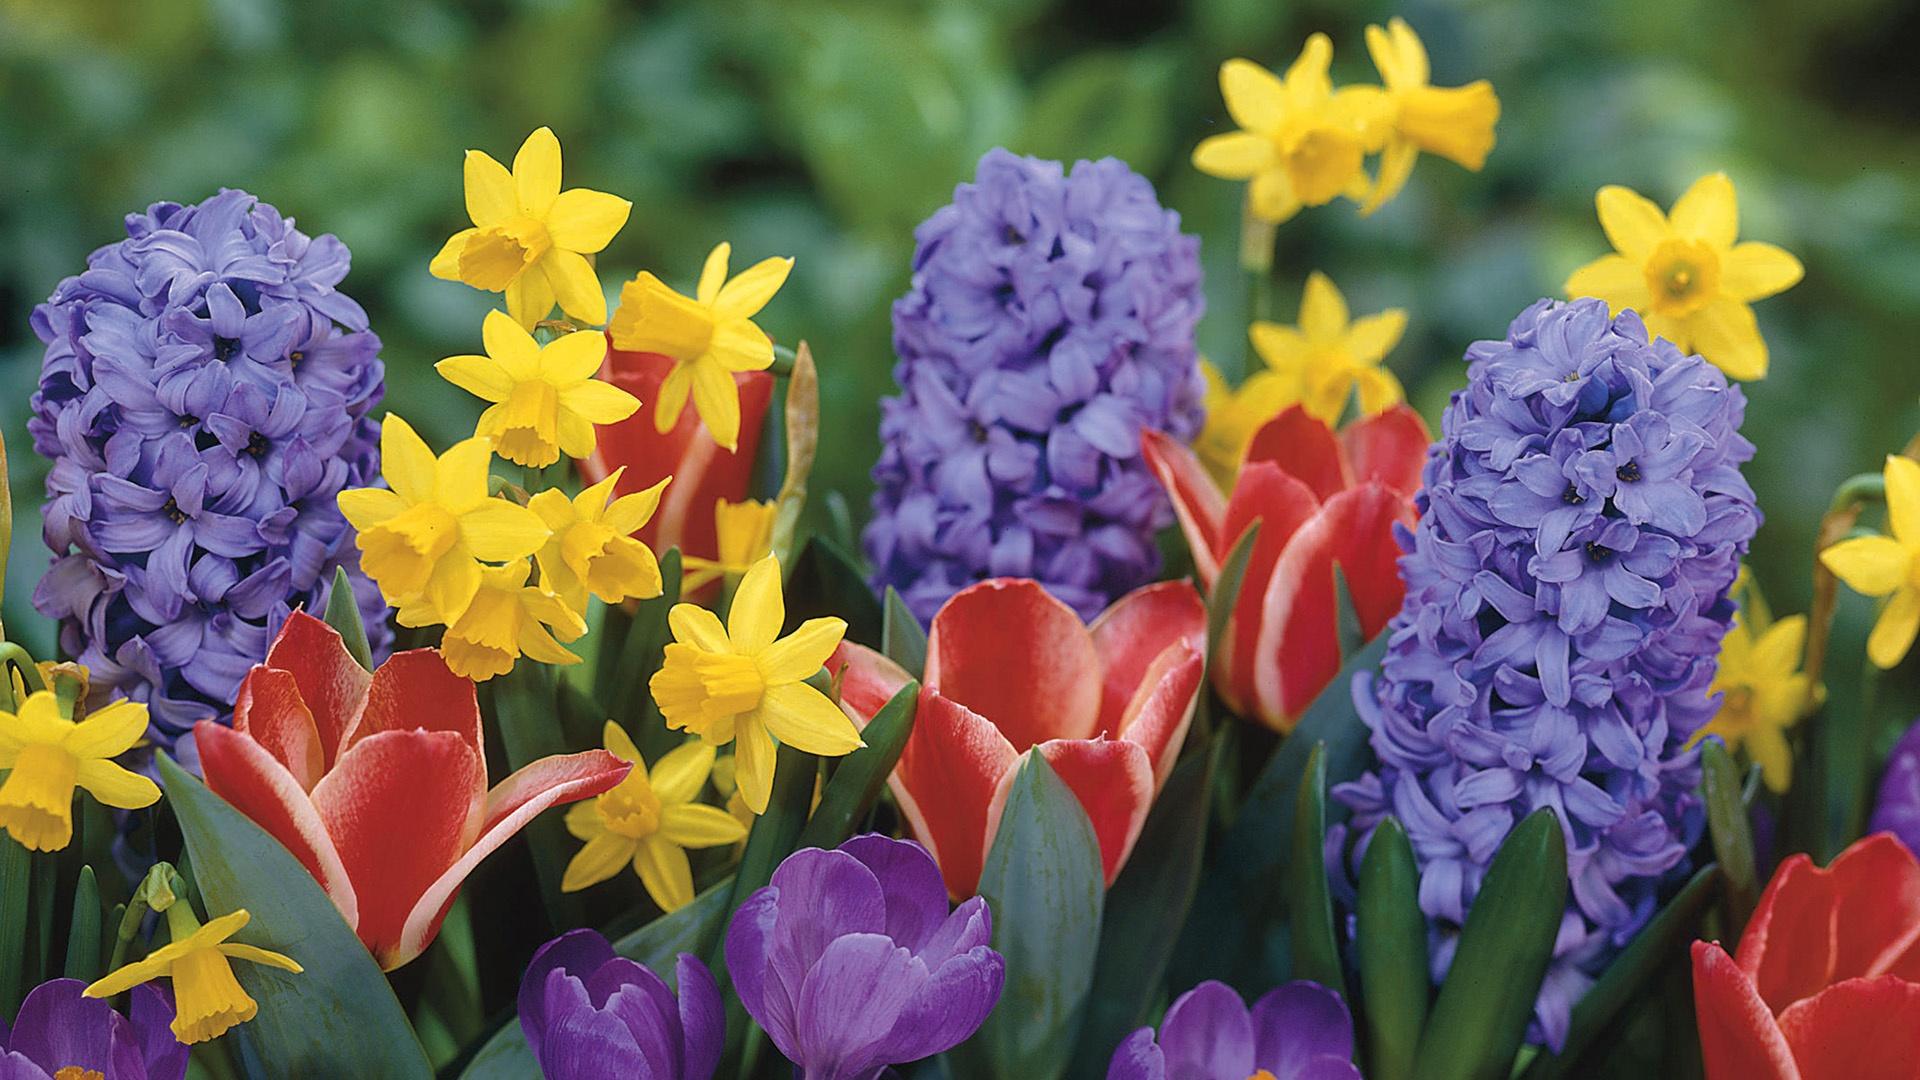 Daffodils-tulips-crocus-hyacinth-flowers_1920x1080